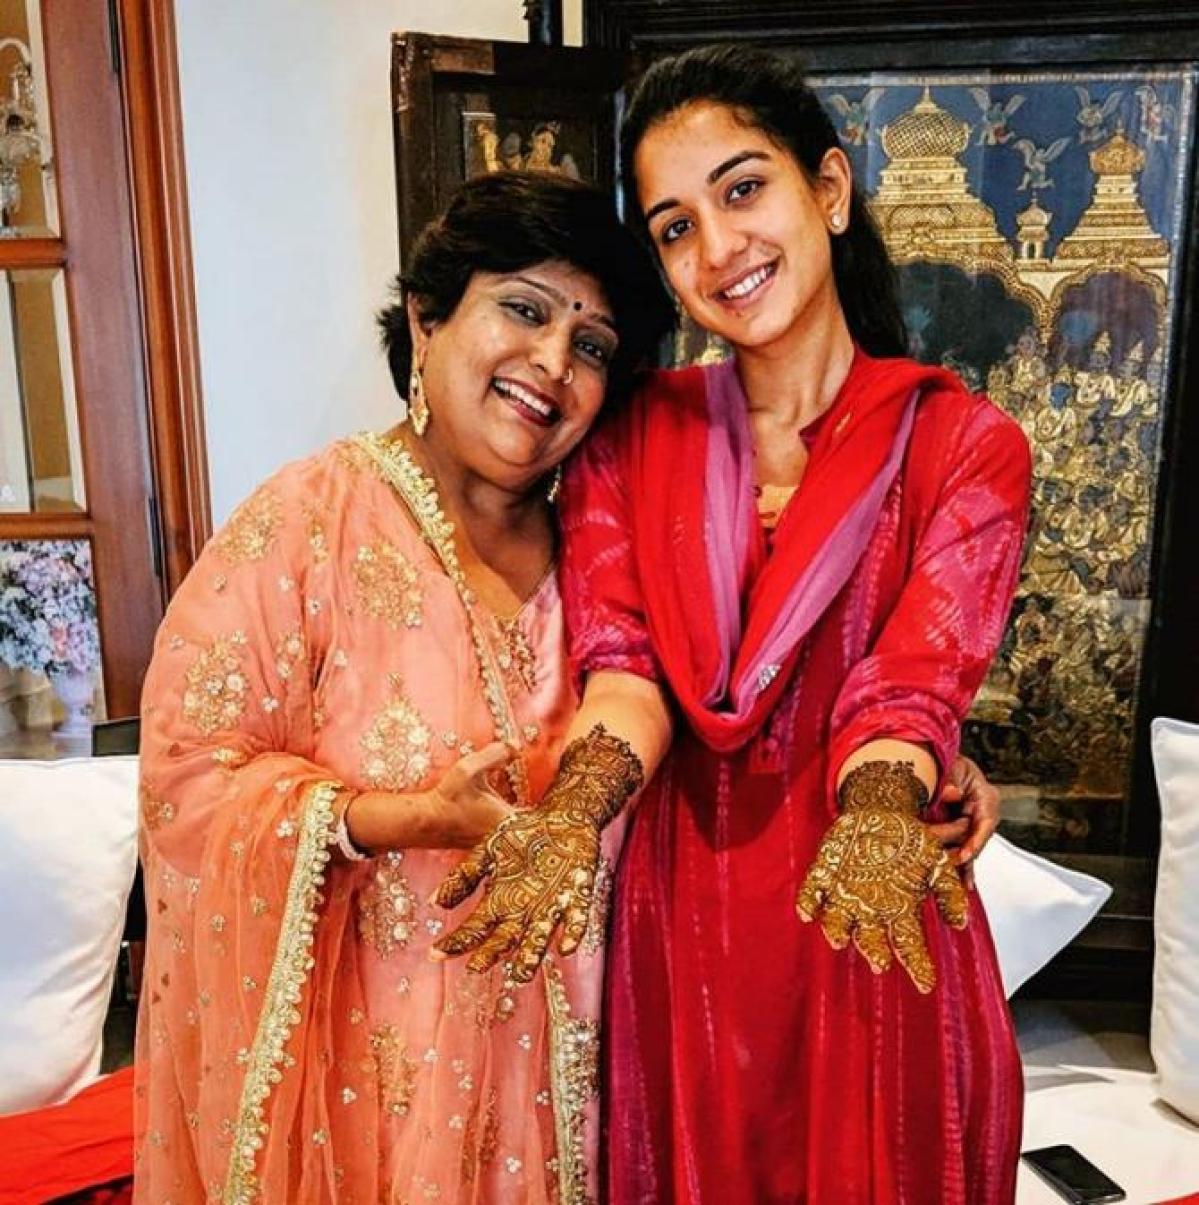 Radhika Merchant slays in her 'No make-up' look atAkash -Shloka's mehendi ceremony